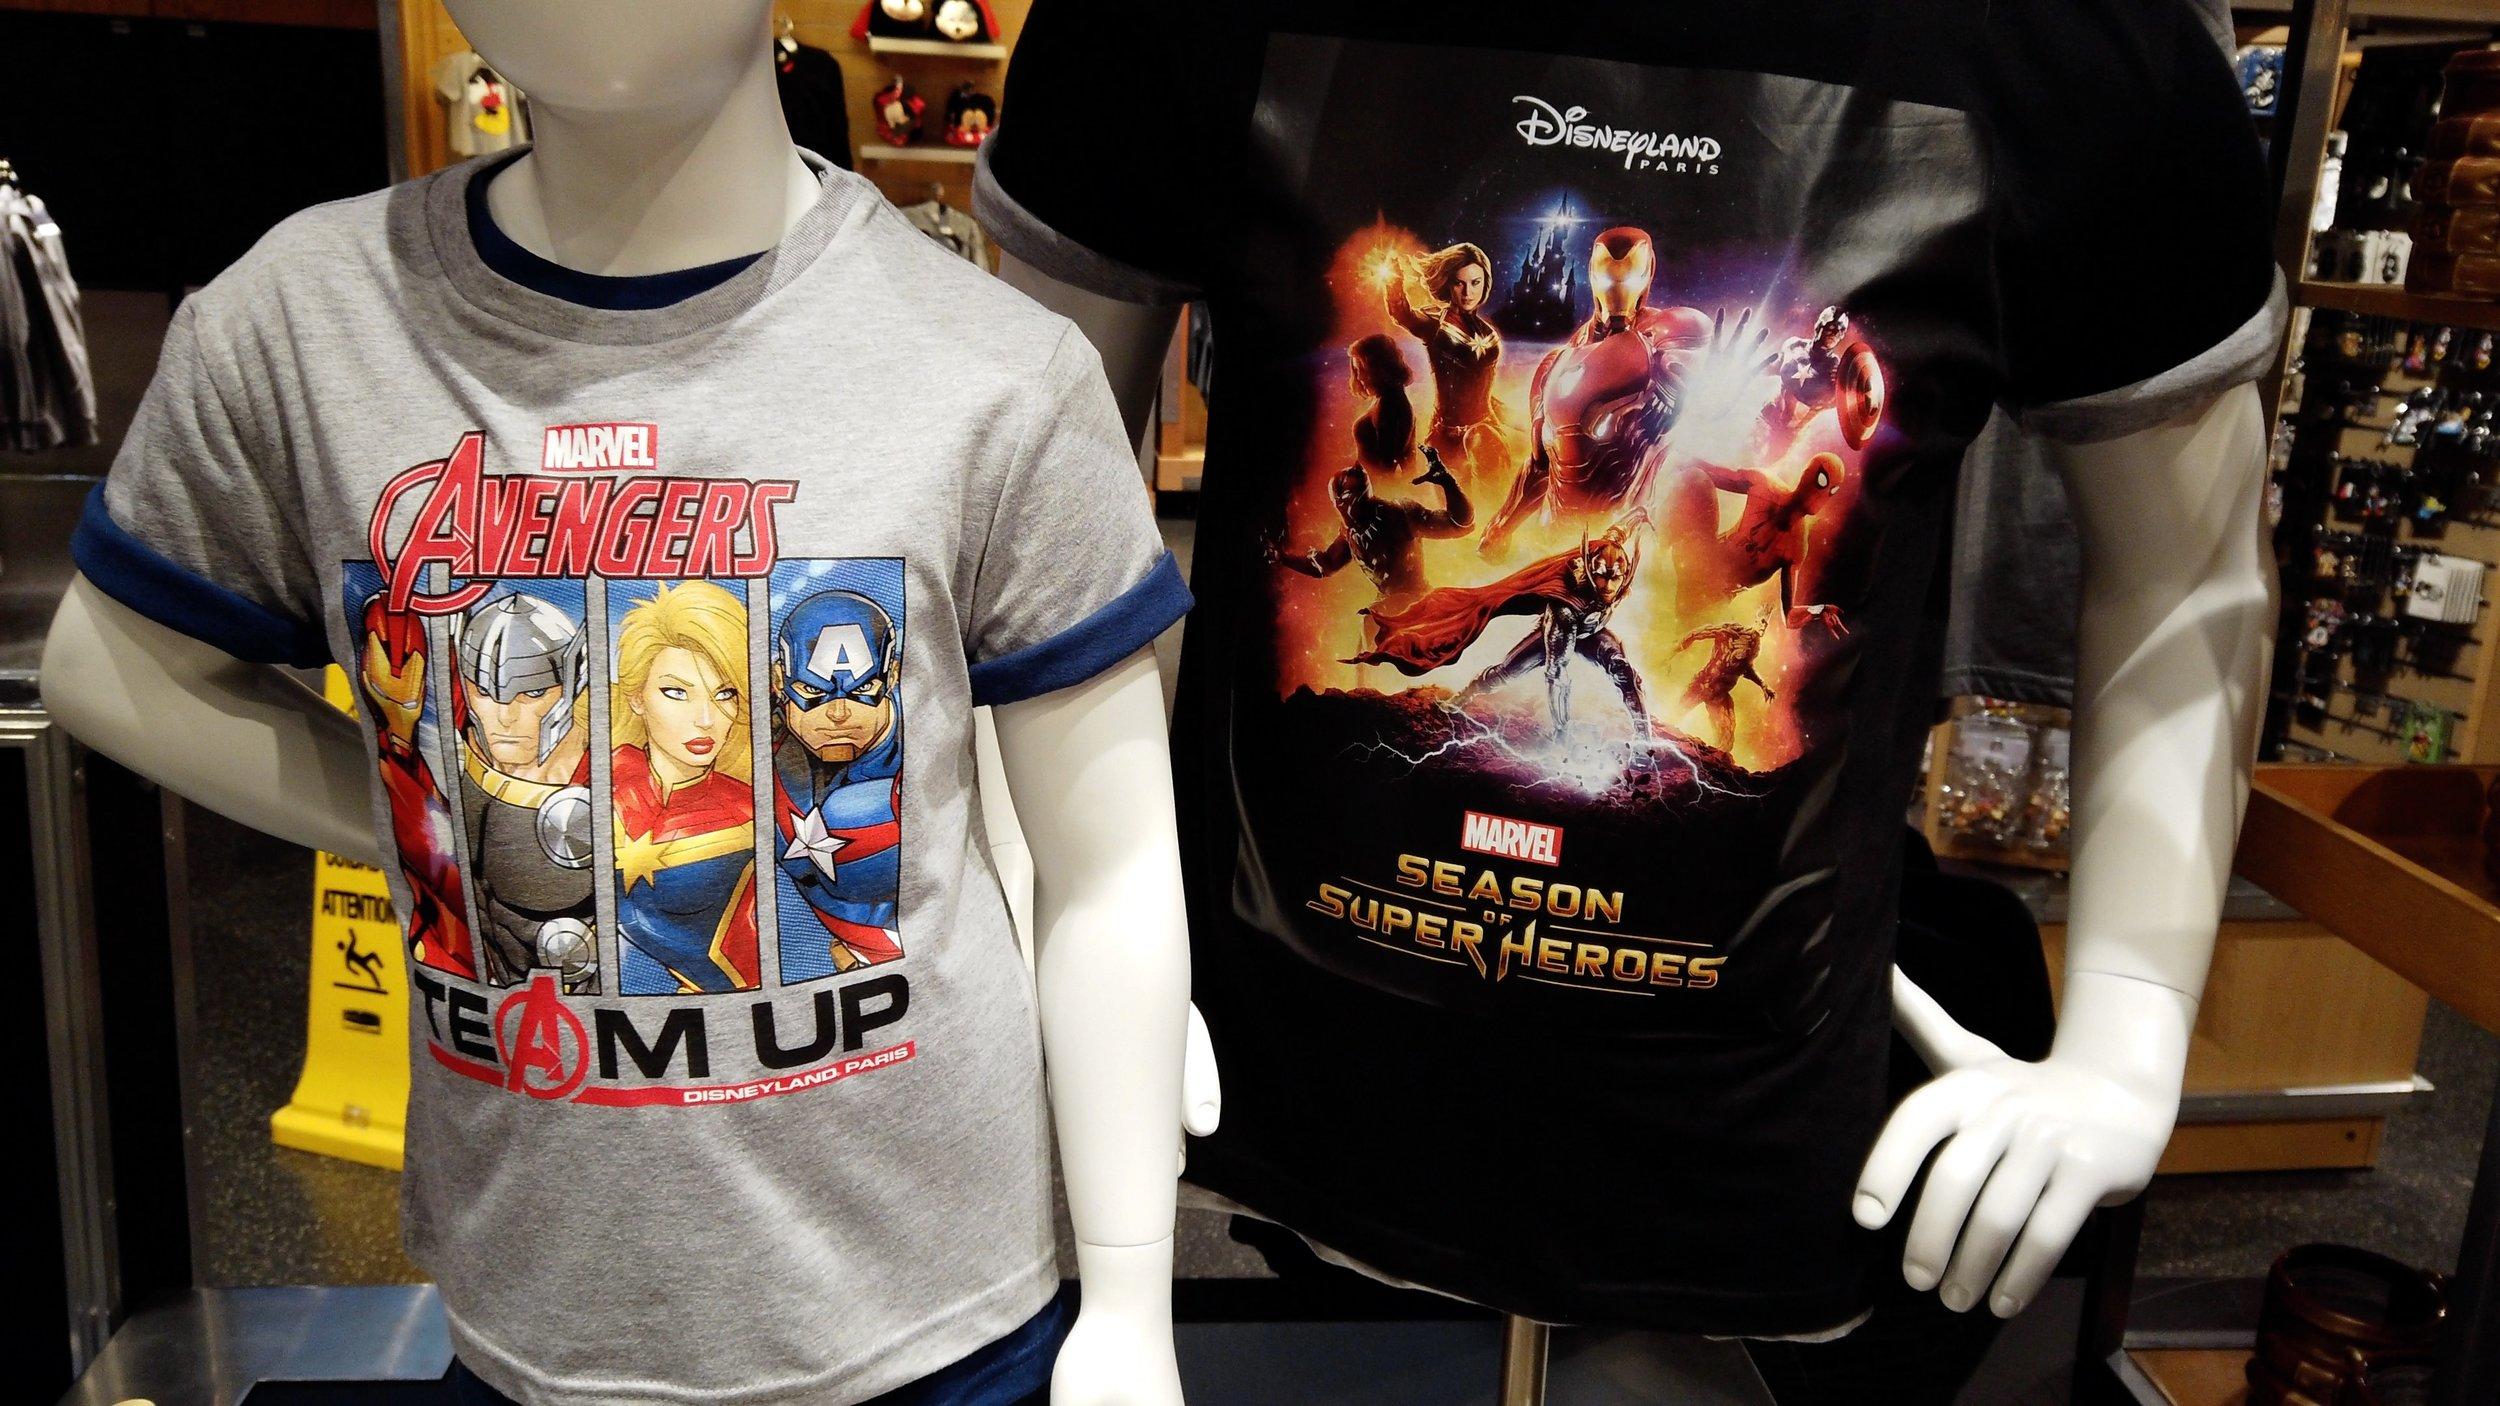 Marvel Season of Super Heroes Shopping at Disneyland Paris.jpg